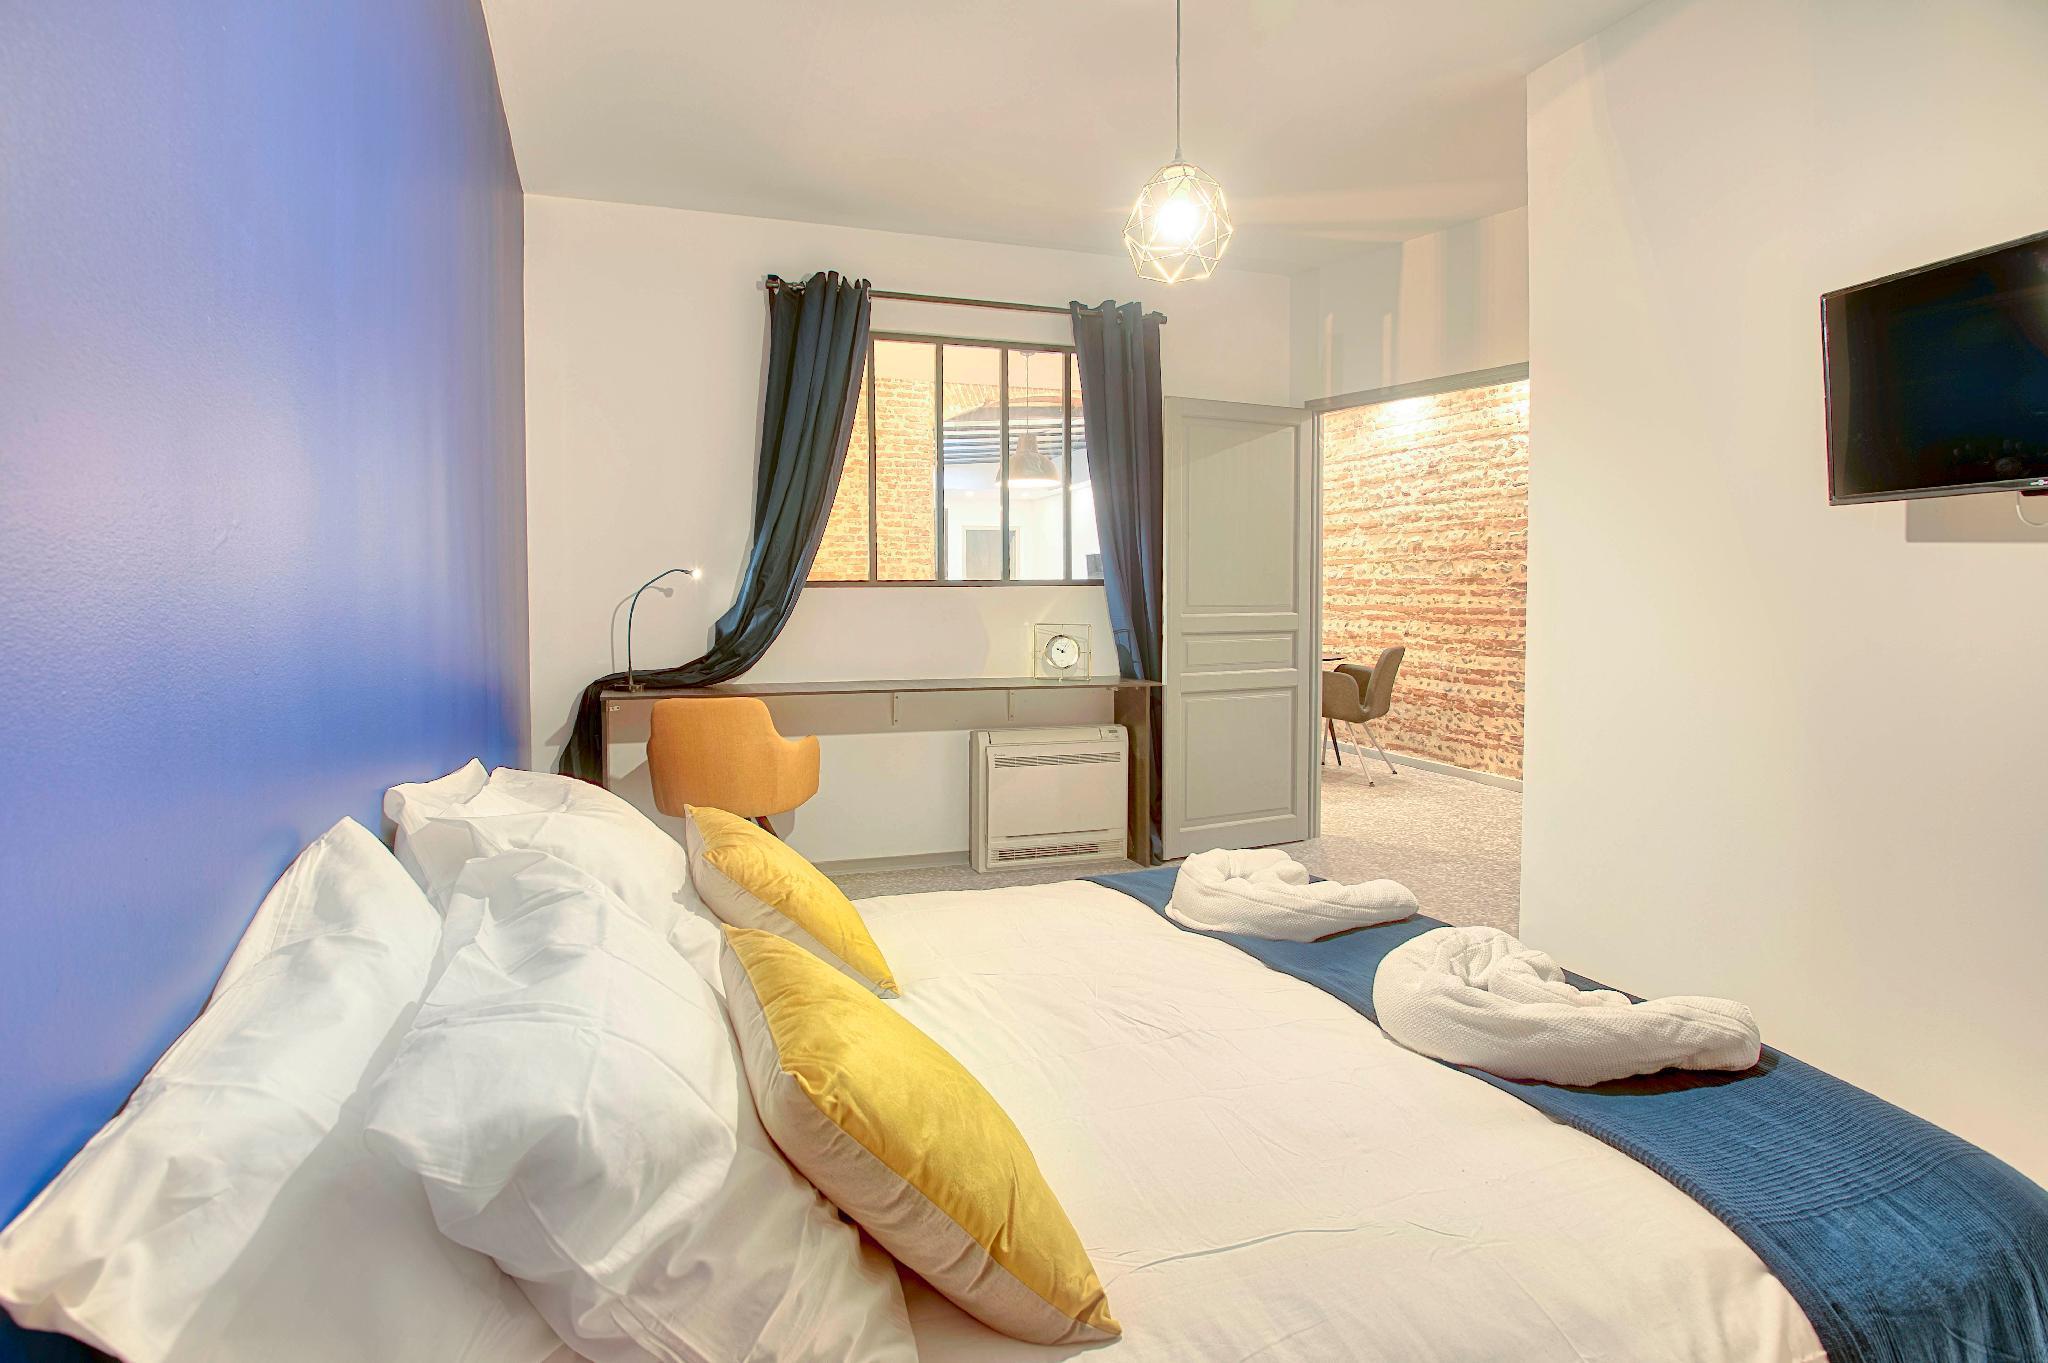 Villa Lafaille Apartment Hotel Standing